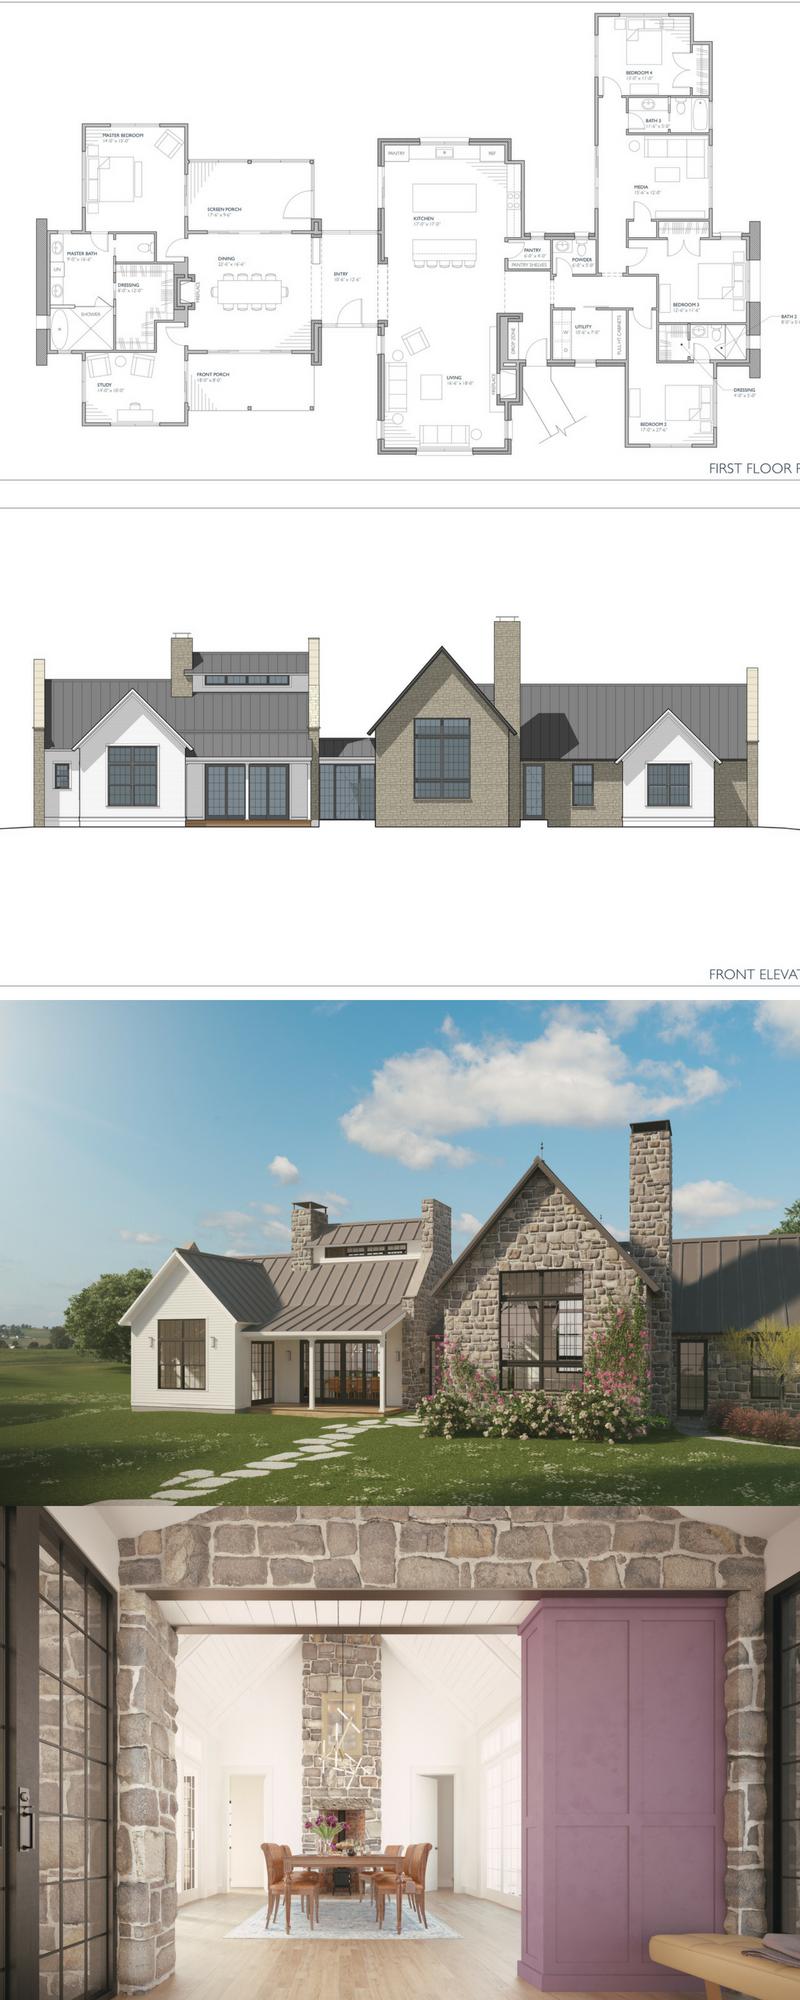 Ferrandaise Farmhouse Plans Modern Farmhouse Plans Modern Farmhouse Floors